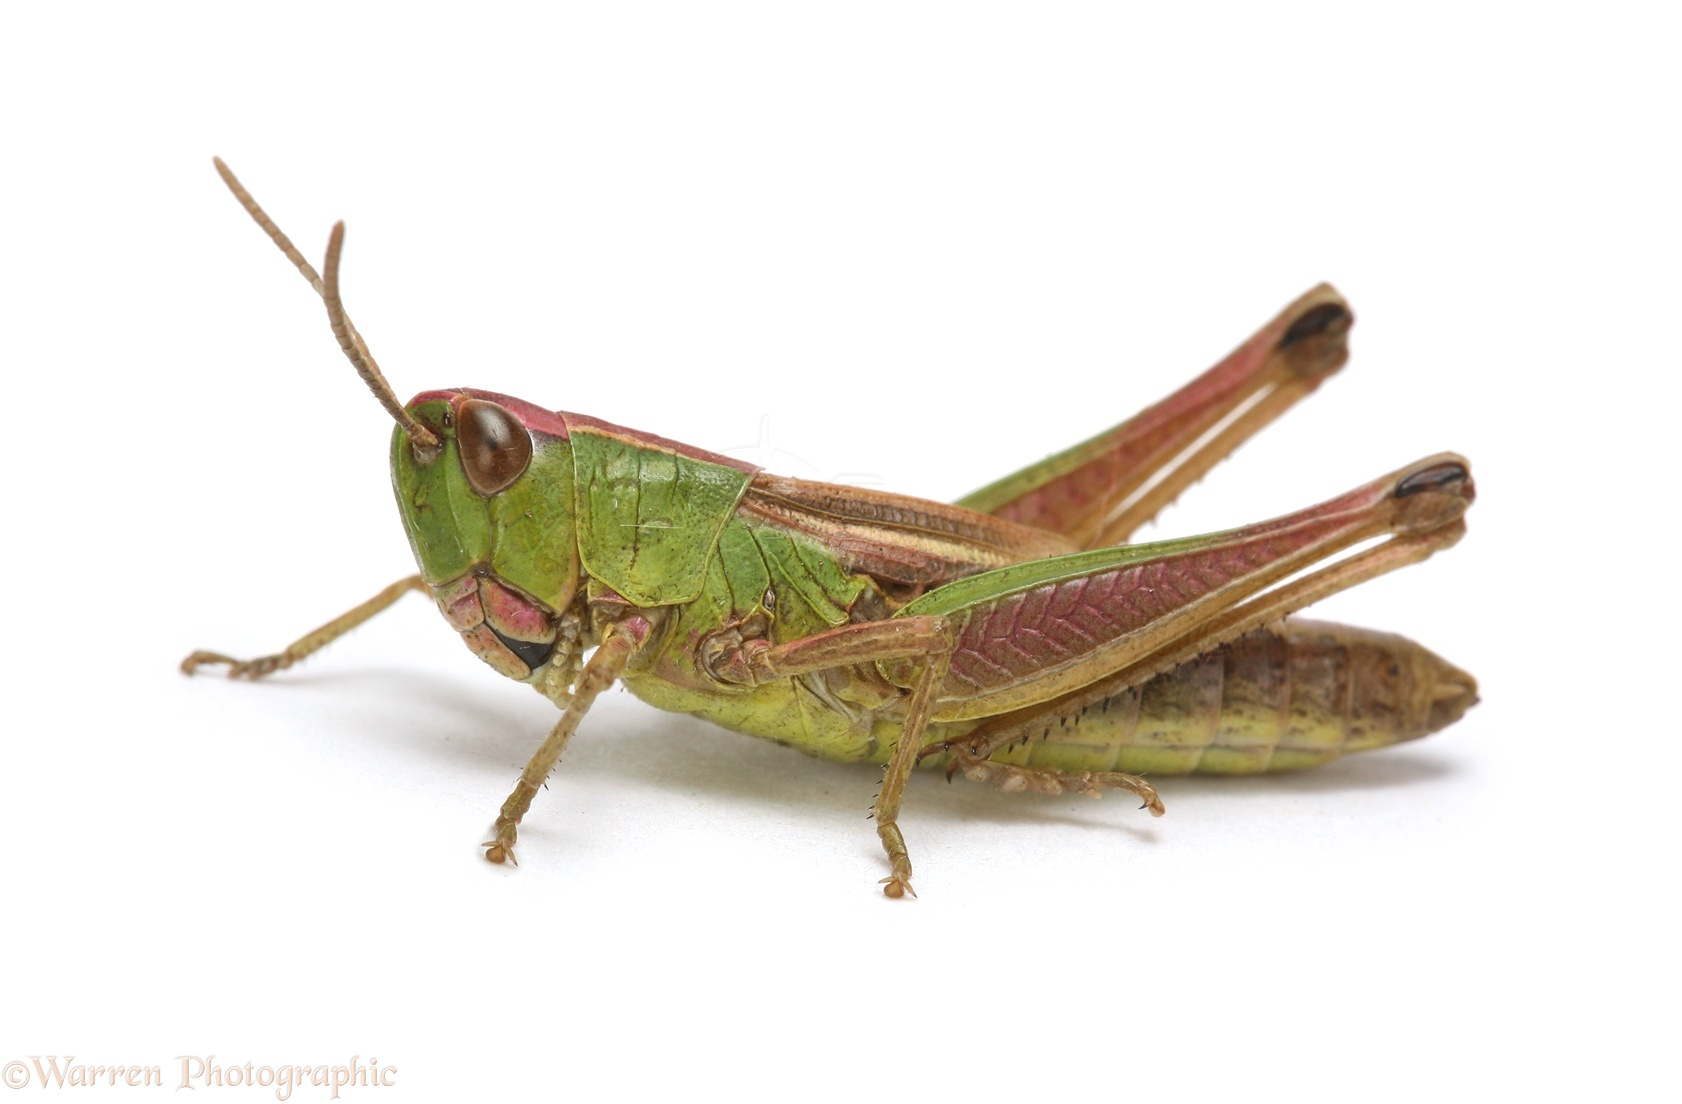 external image 13498-Meadow-Grasshopper-white-background.jpg